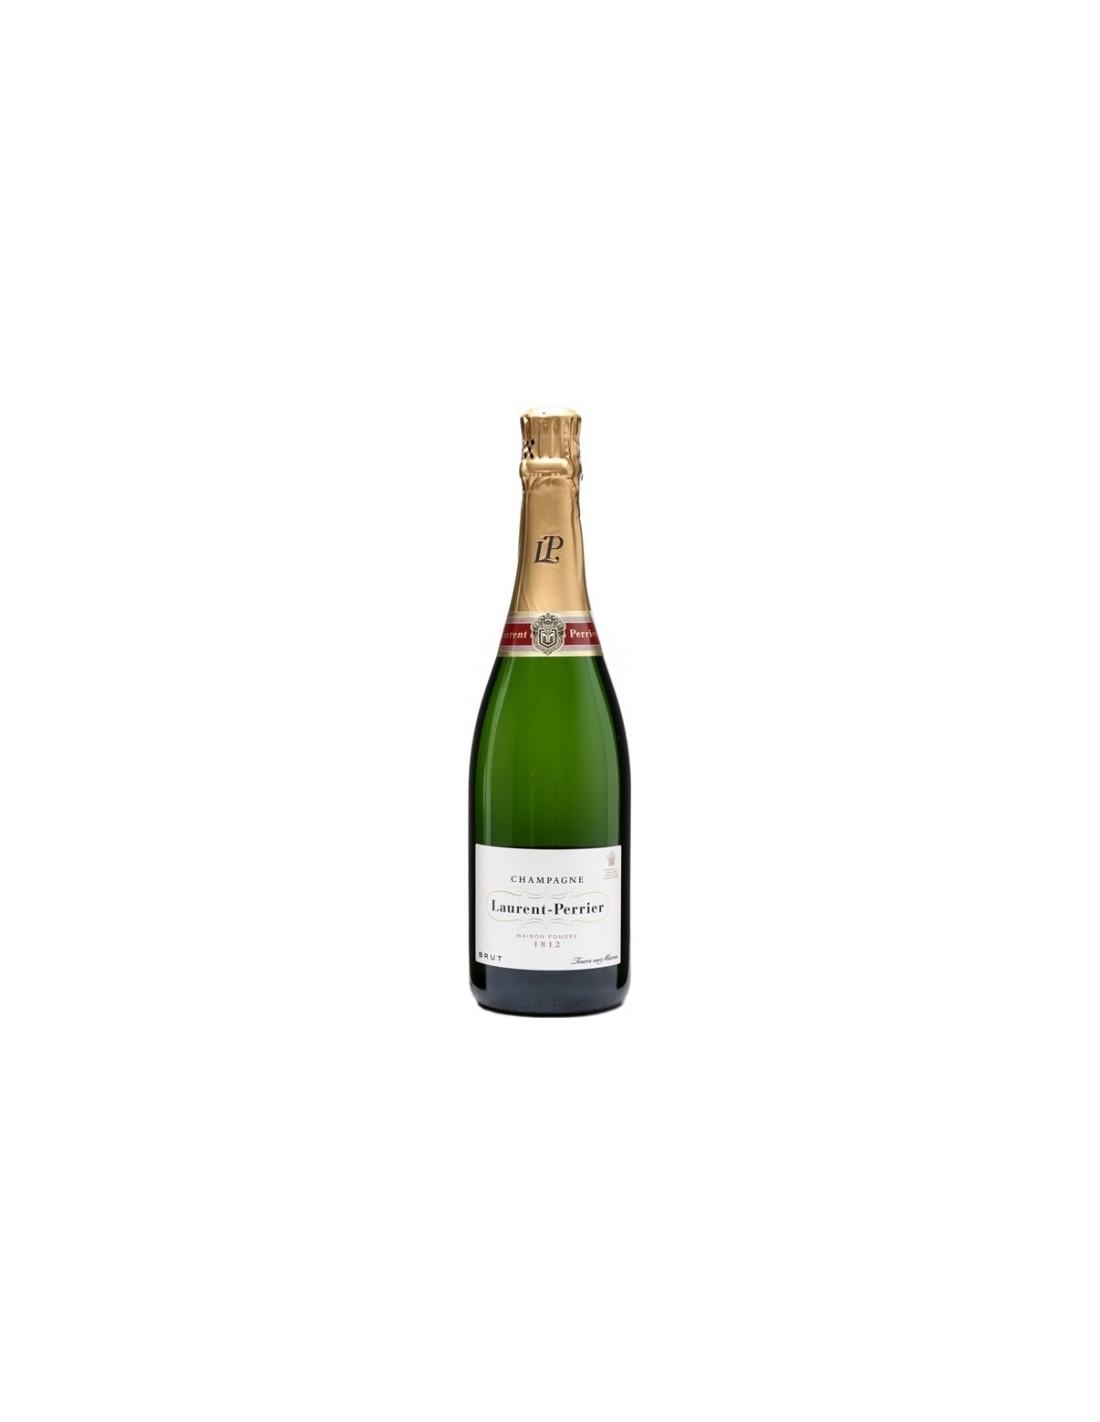 Sampanie Cupaj, Laurent Perrier La Cuvée Champagne, 0.75L, 12% alc., Franta